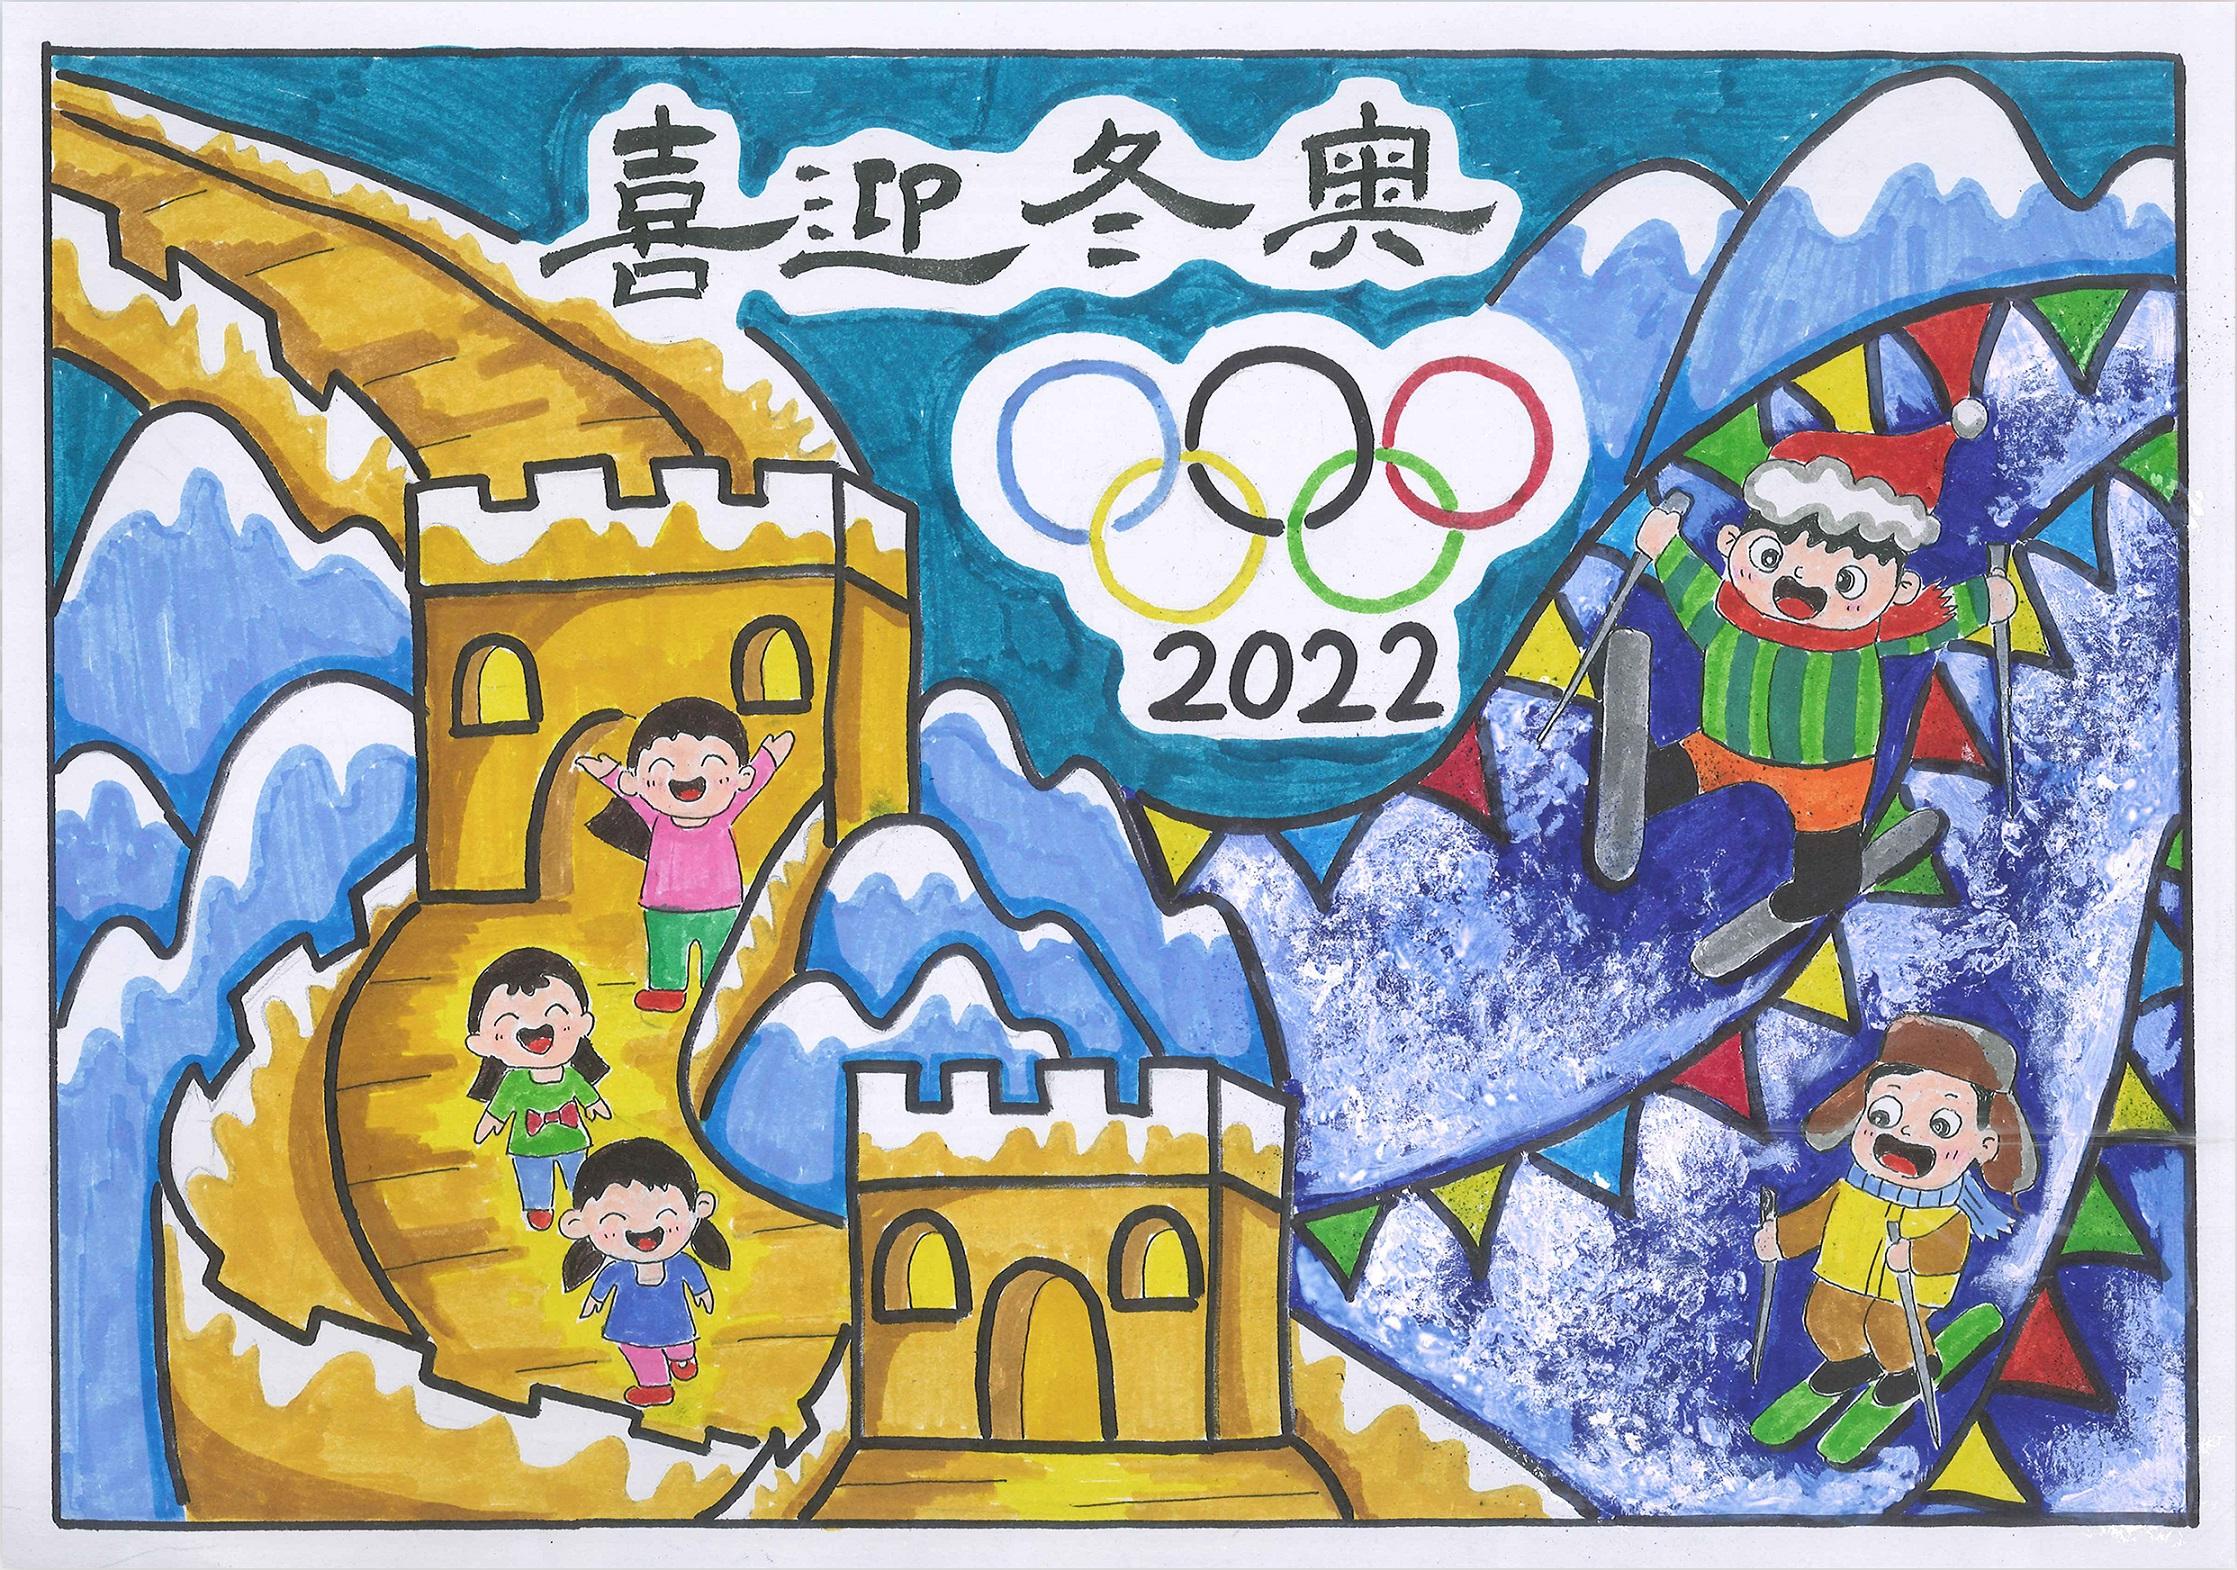 喜迎冬奥 Welcome To The Winter Olympics+闫嘉一 Yan Jiayi